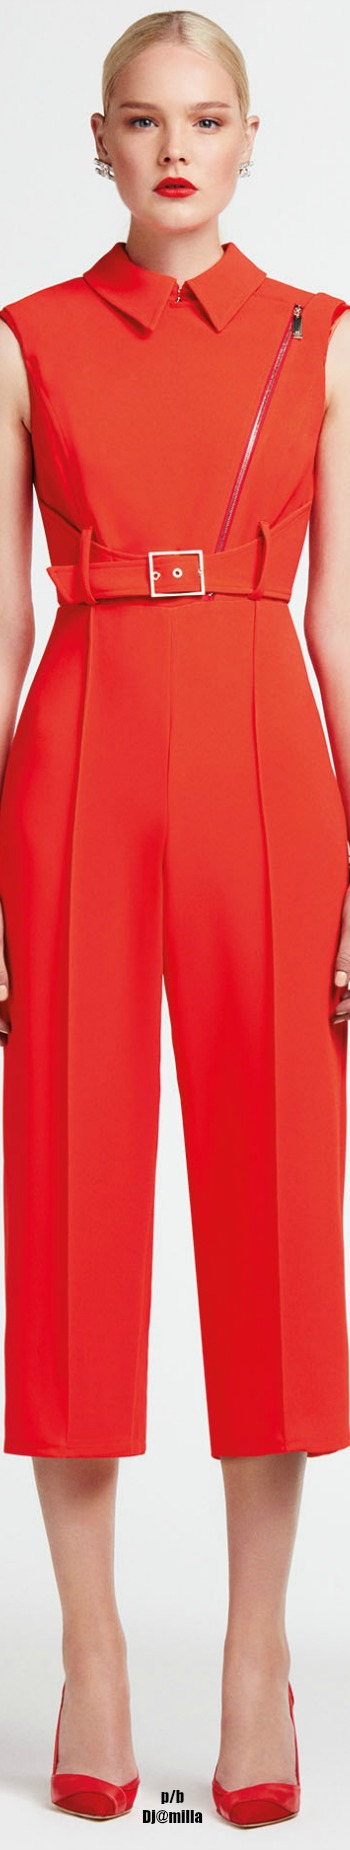 Rosamaria G Frangini | Color Fashion Glam |ELISABETTA FRANCHI Spring Summer 2017 - Lookbook